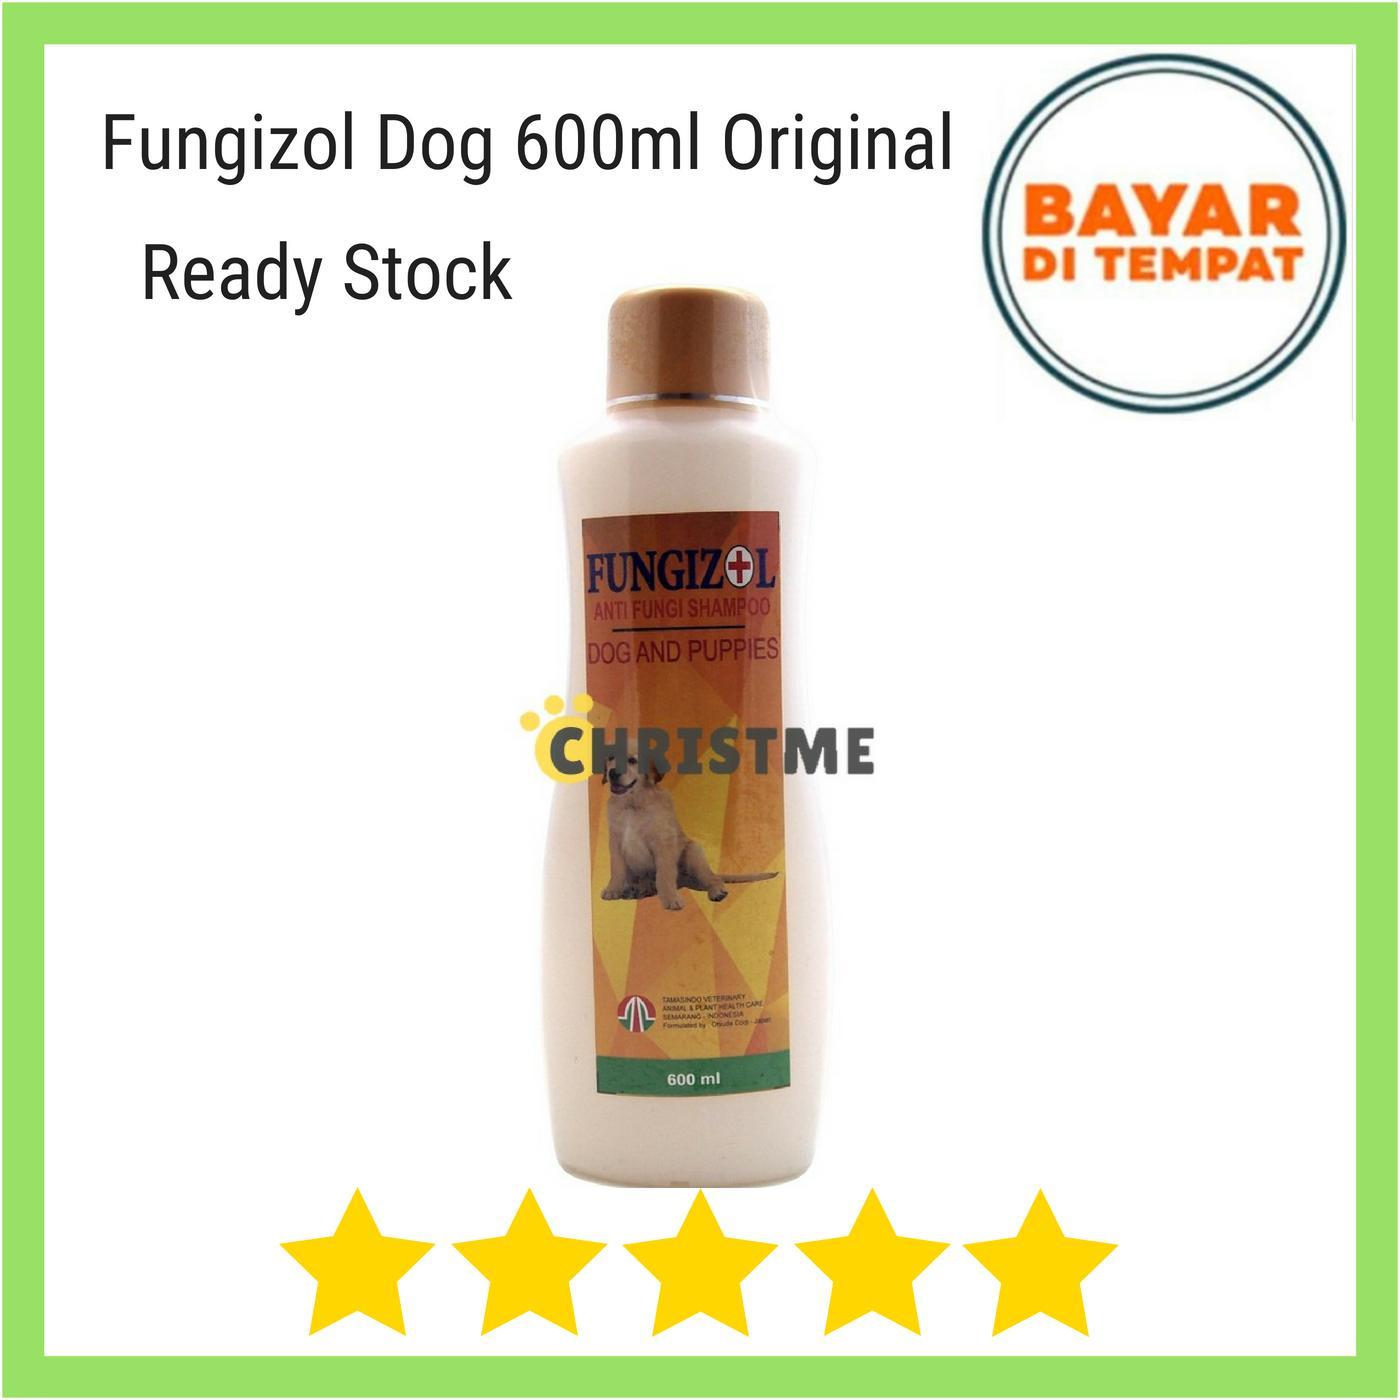 Fungizol Dog 600ml - Shampoo Anti Jamur Atau Fungi Anjing Dog Doggies Doggie Puppies By Christ Me.